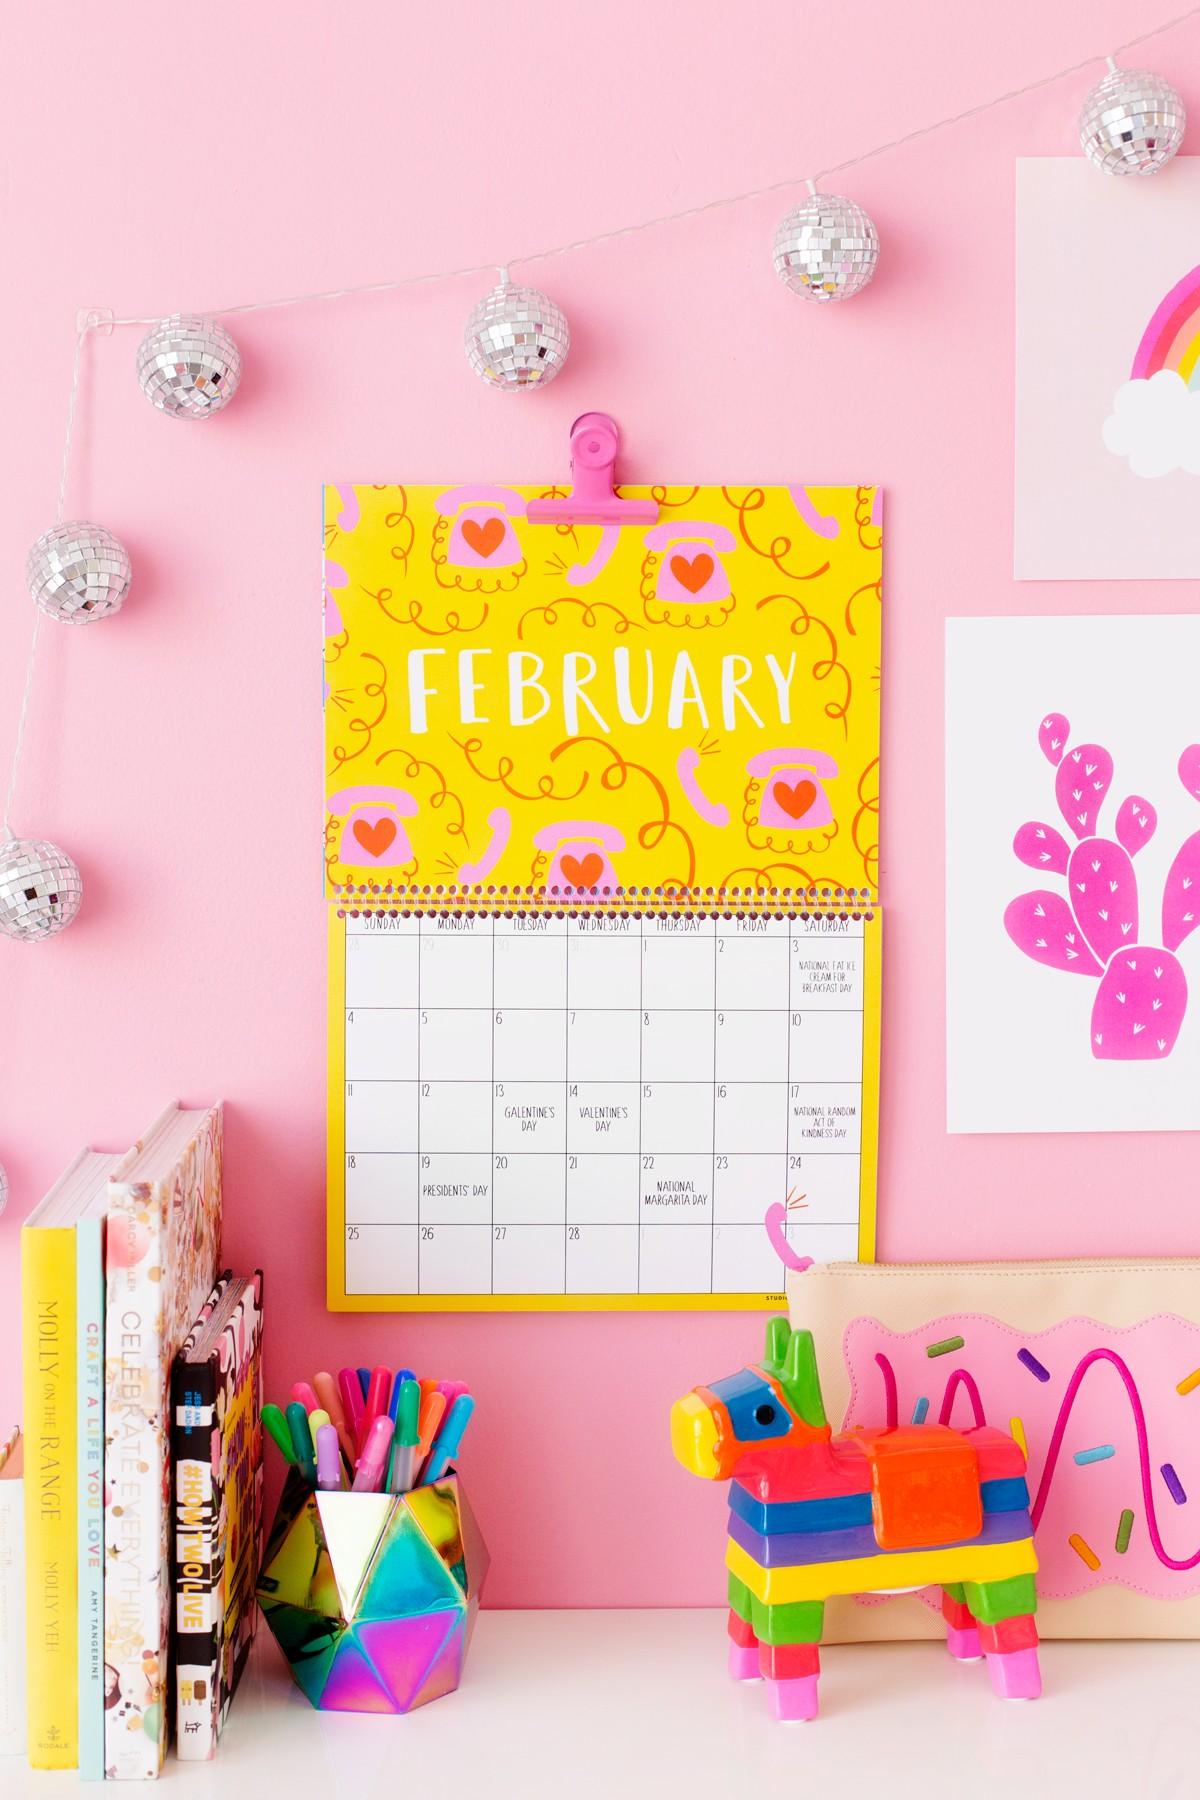 2018 Free Printable Wall Calendar Studio DIY